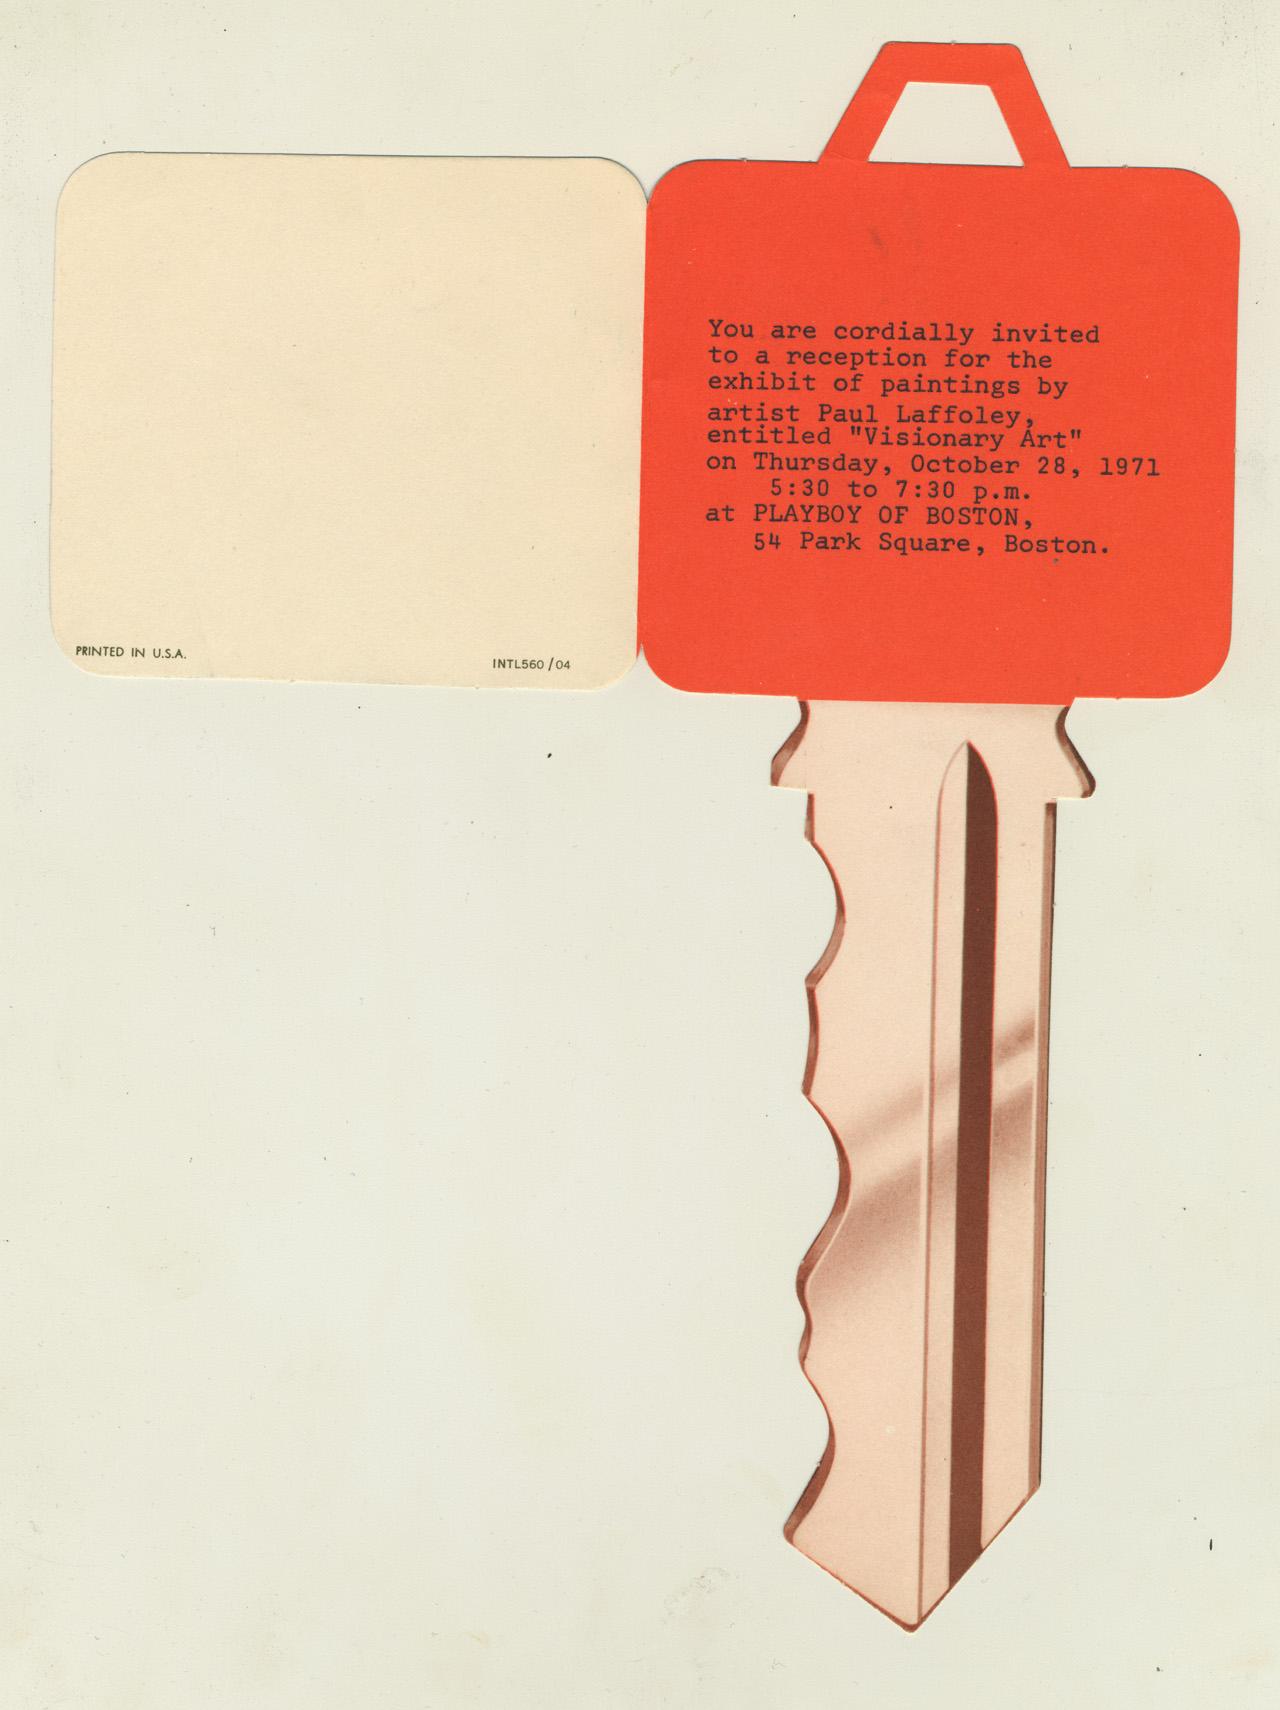 Playboy of Boston Exhibition Announcement, 1971